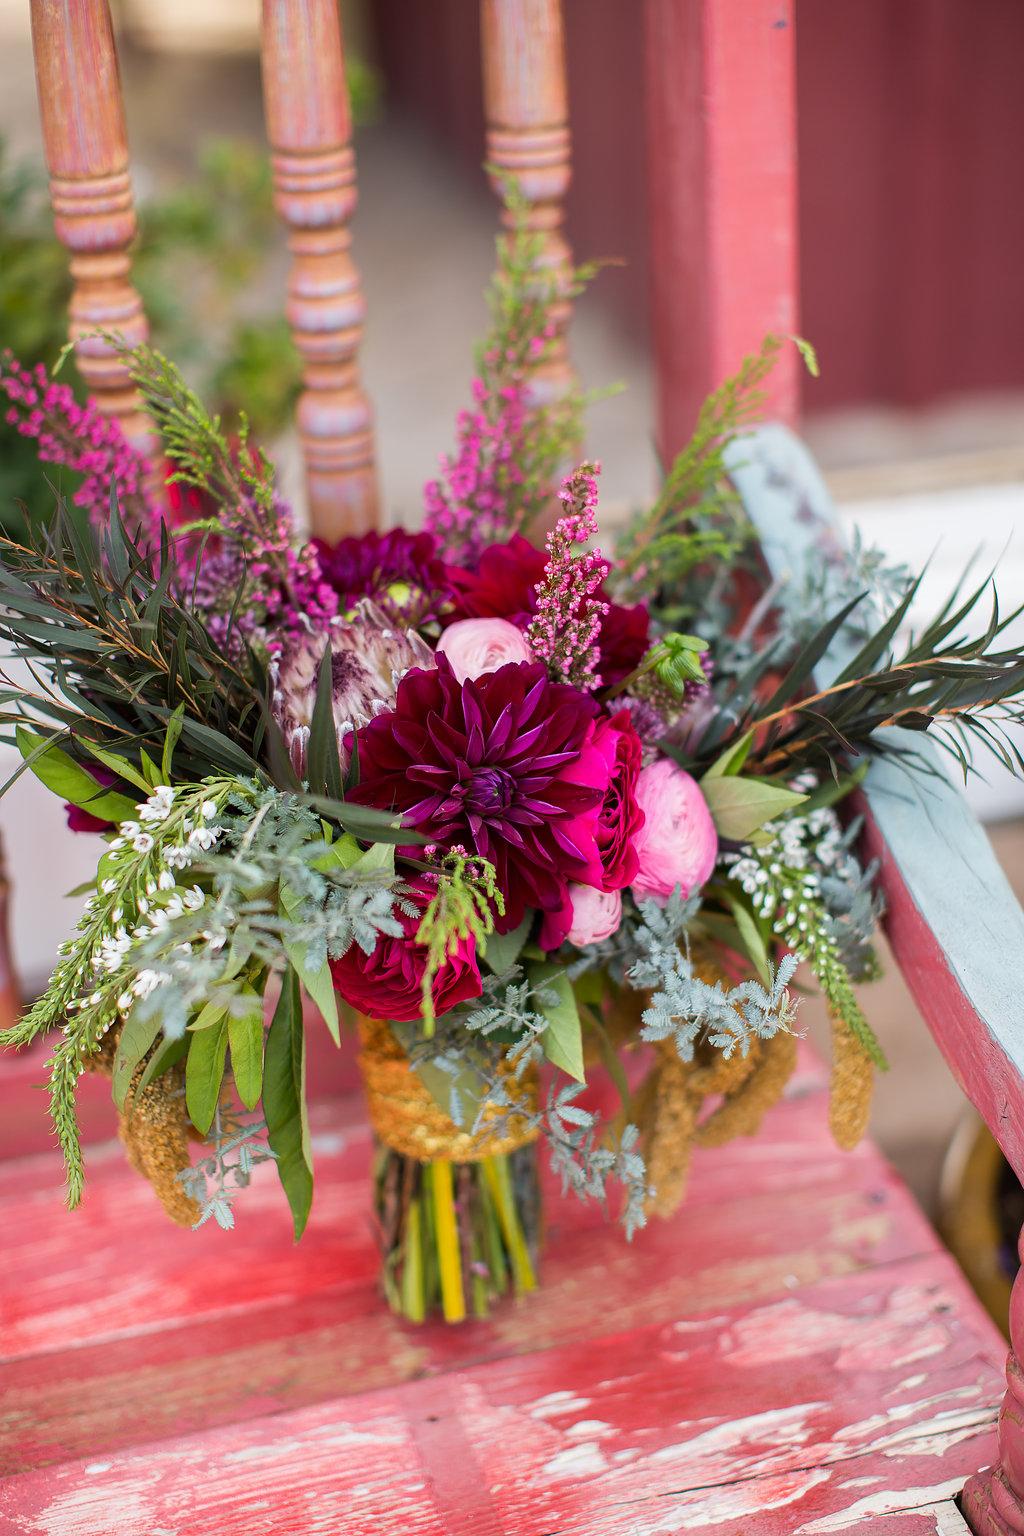 Floral Centric Windmill Winery Styled Shoot- Konsider It Done- AZ Arizona Wedding & Event Planner, Designer, Coordinator Planning in Scottsdale, Phoenix, Paradise Valley, Tempe, Gilbert, Mesa, Chandler, Tucson, Sedona